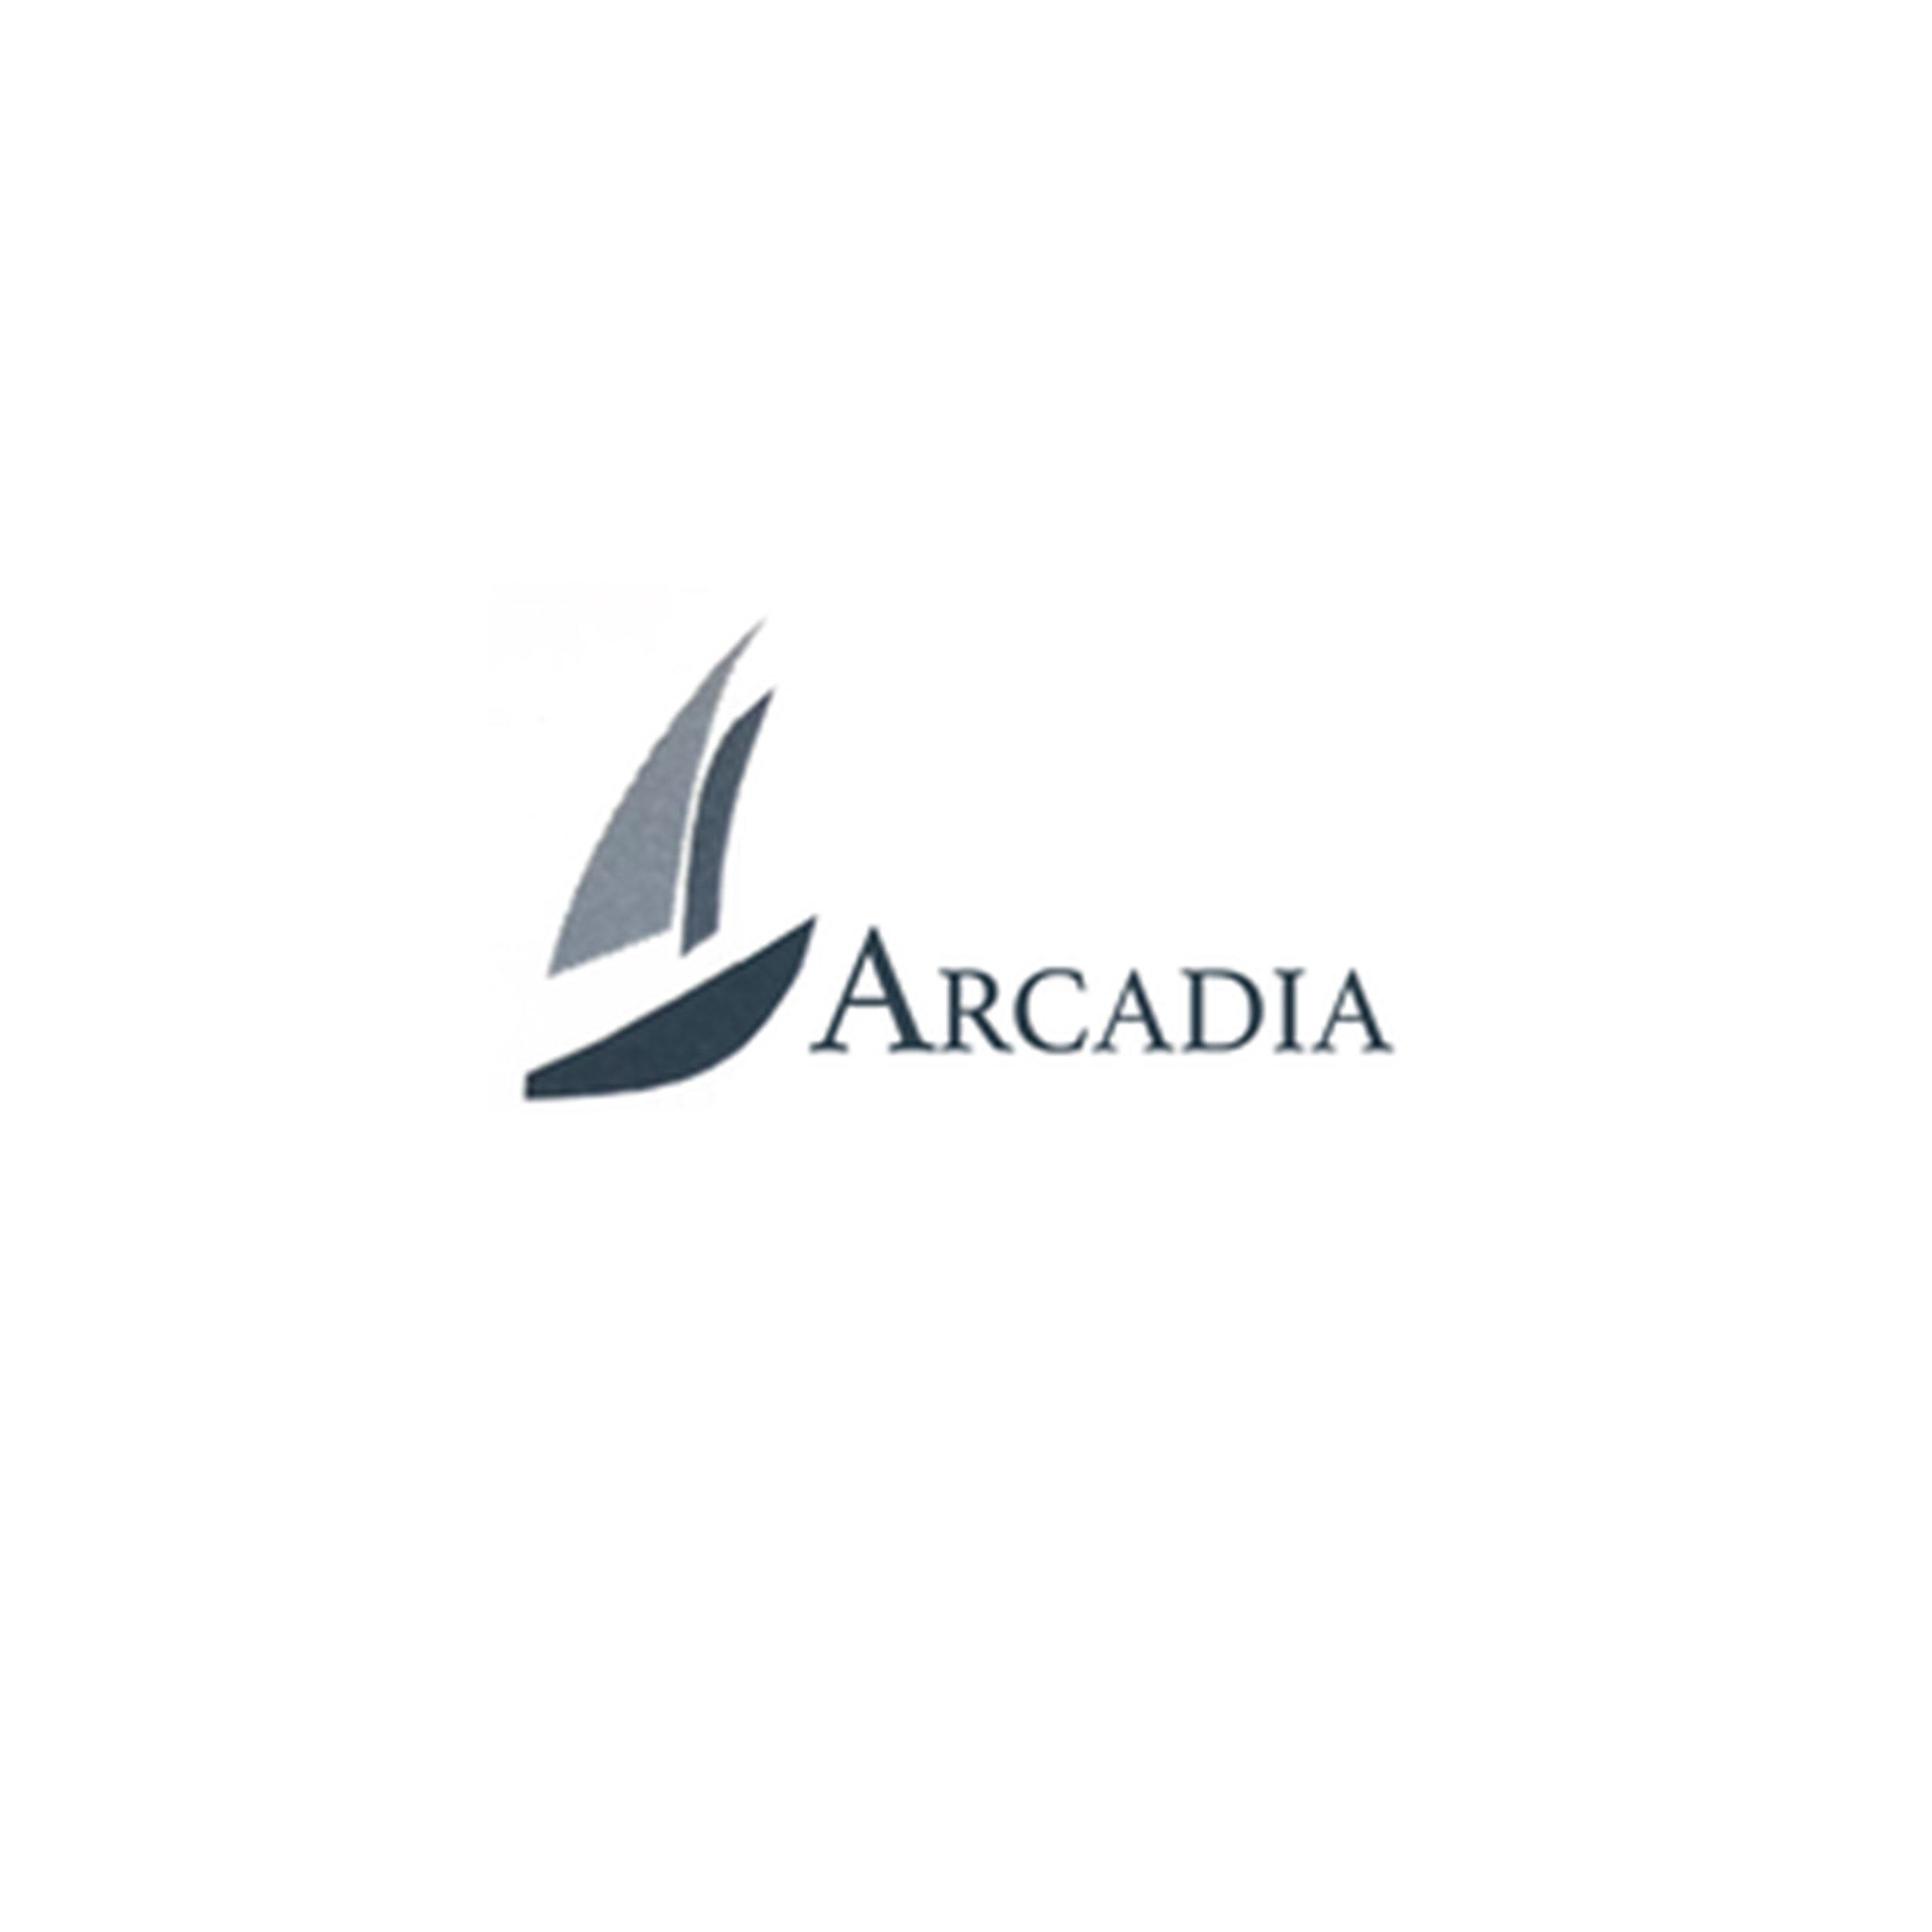 ArcadiaLogo.jpg